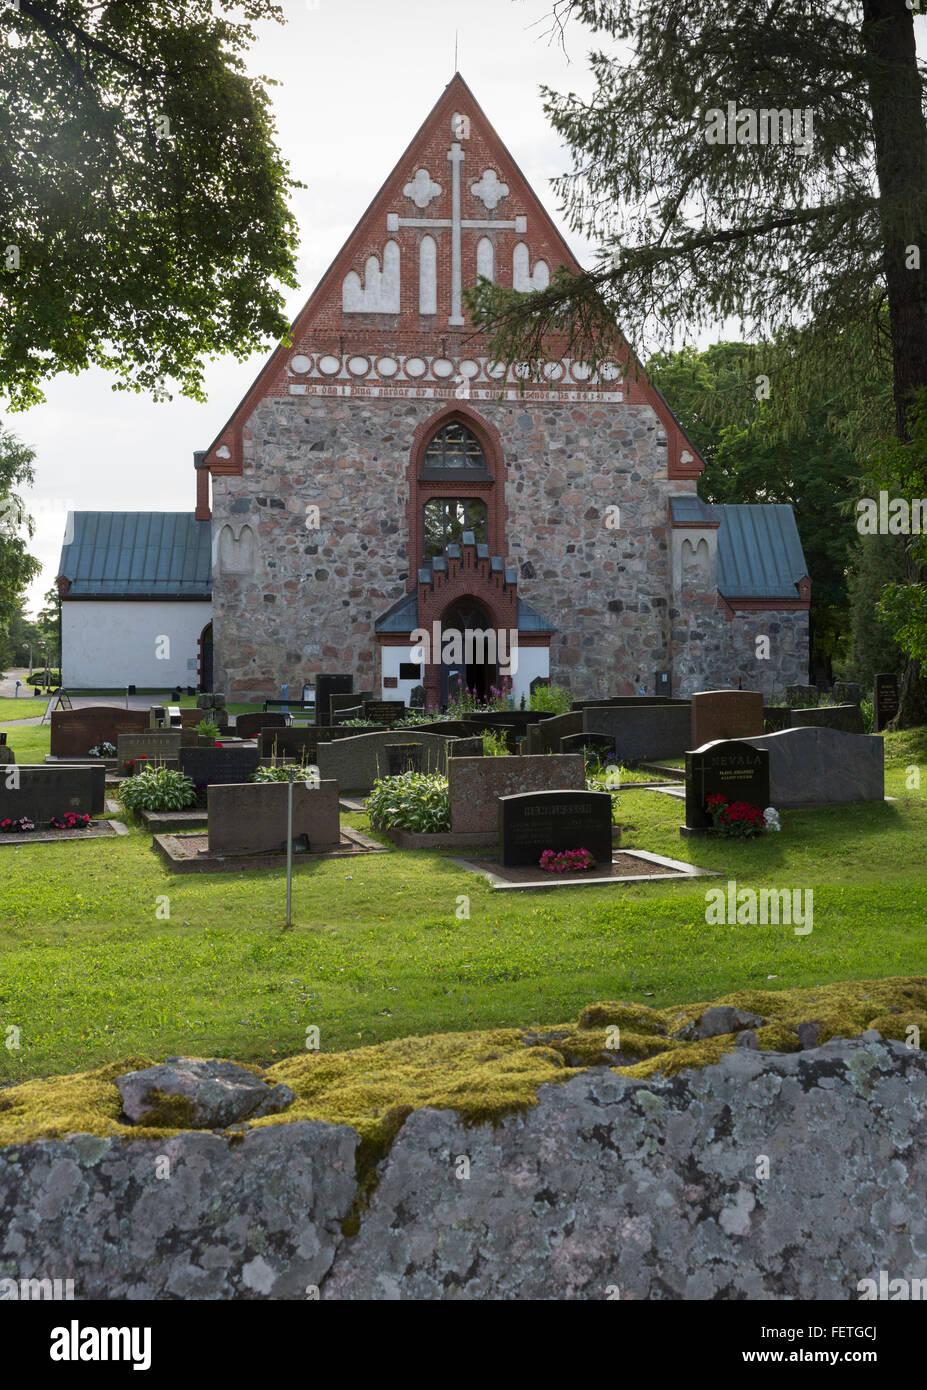 The Church of St. Lawrence (Finnish: Vantaan Pyhän Laurin kirkko; Swedish: Helsinge kyrka S:t Lars) is a church - Stock Image